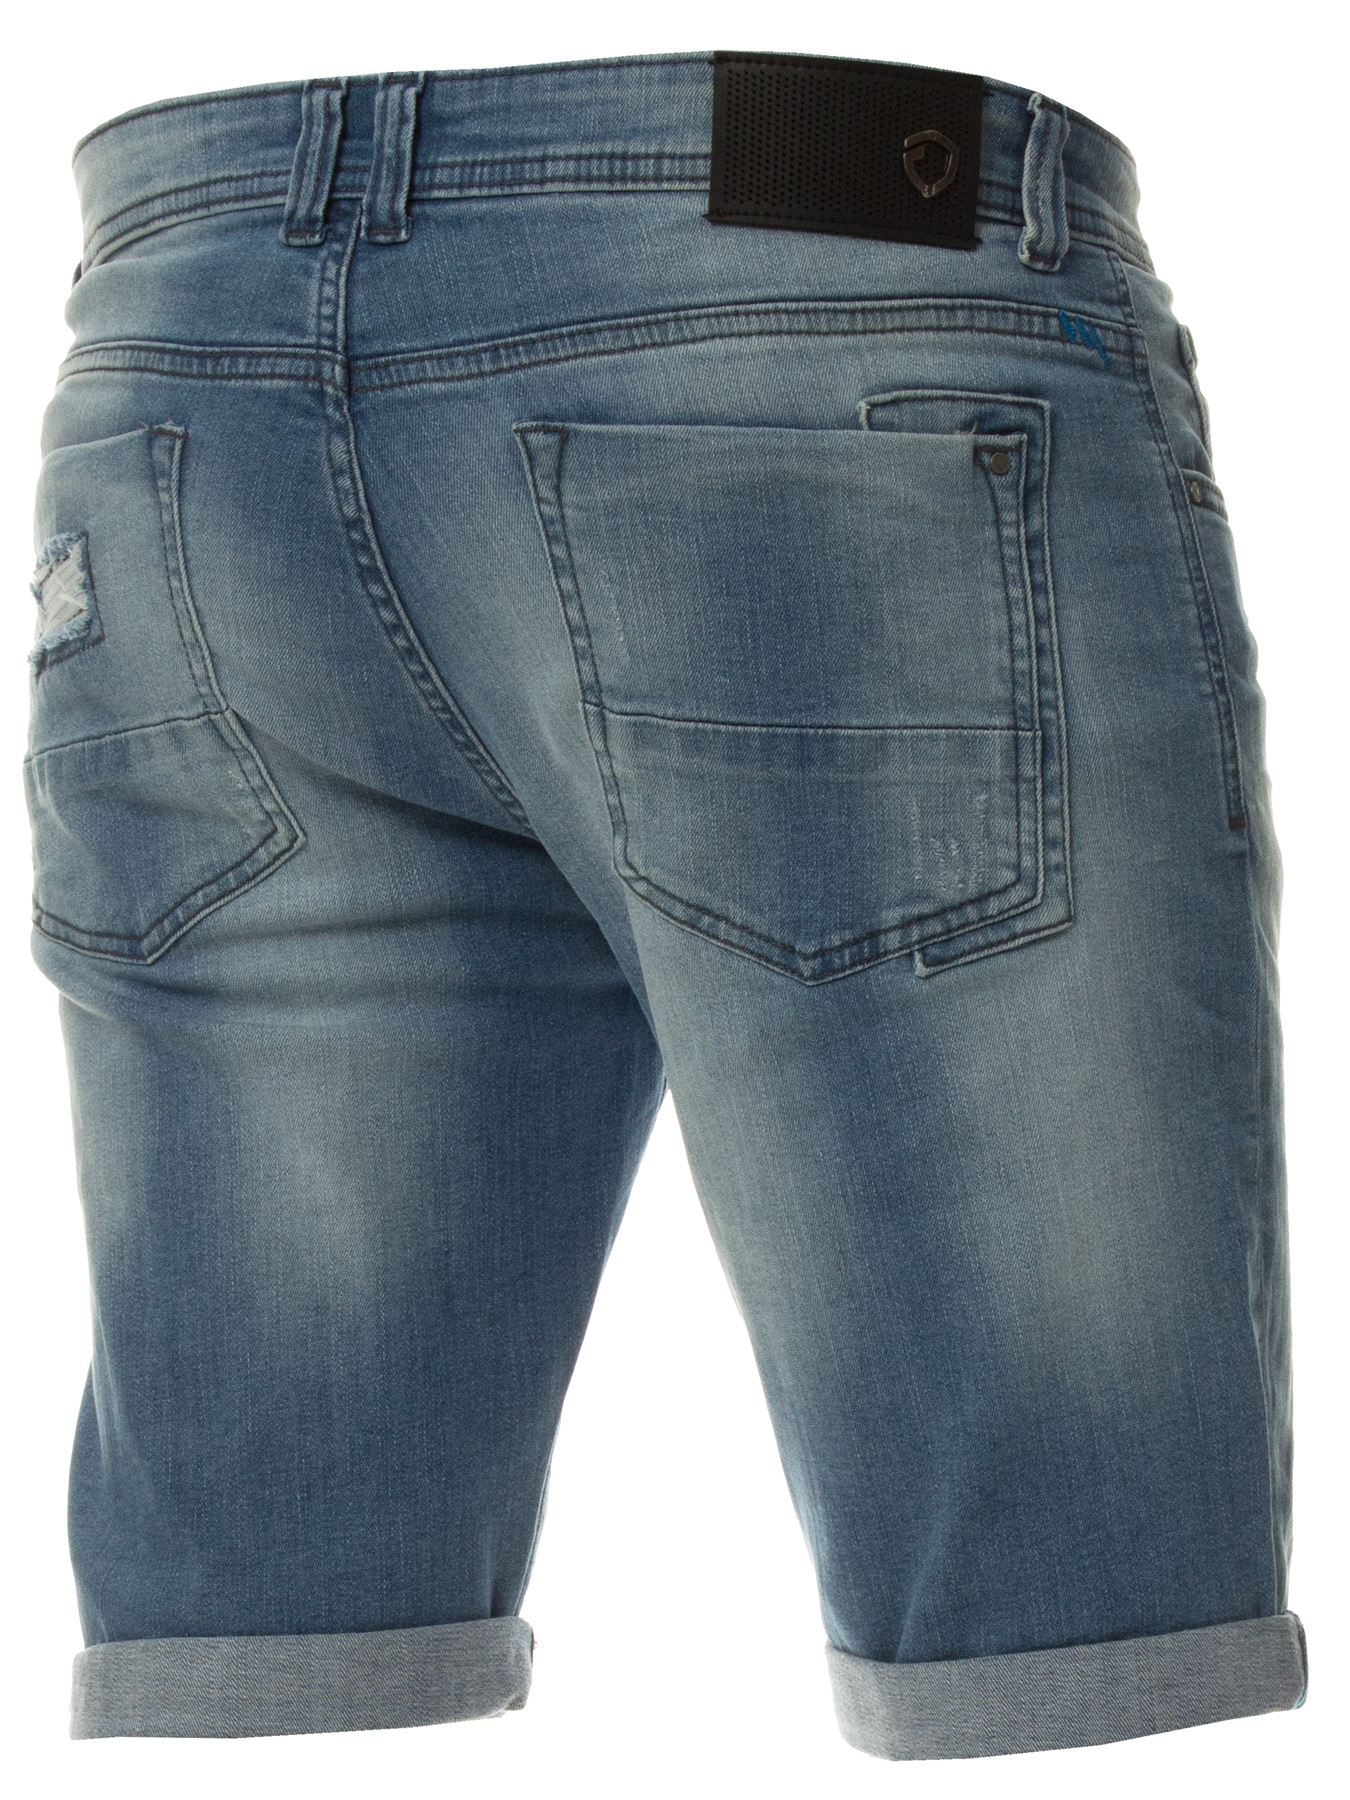 Mens-Denim-Shorts-ETO-Jeans-Stretch-Slim-Fit-Distressed-Ripped-Blue-Half-Pants thumbnail 10